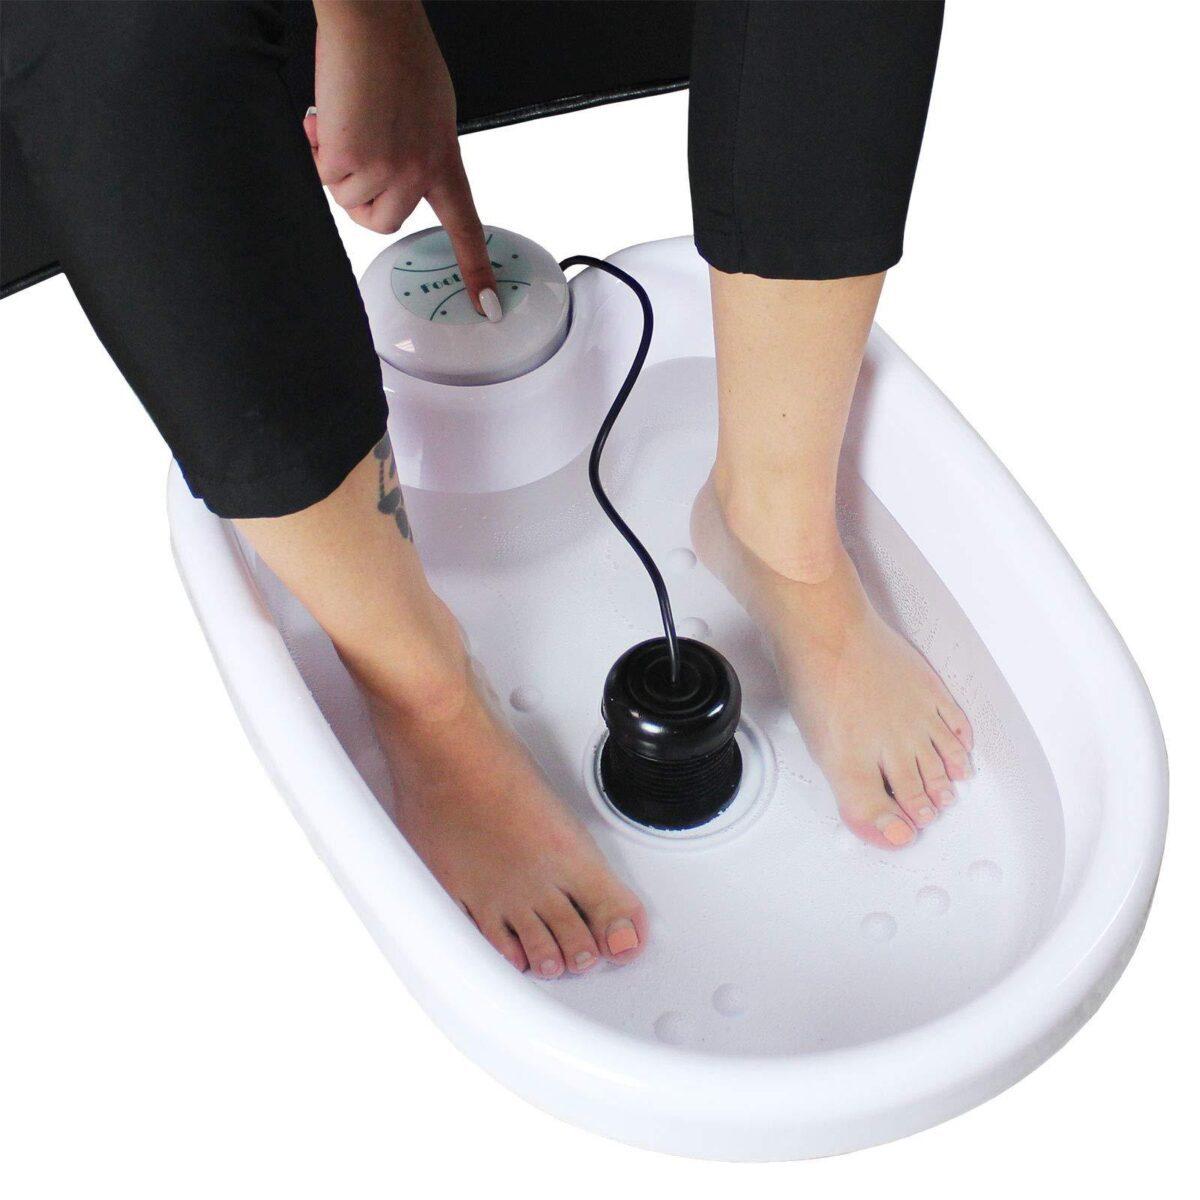 Detox foot spa – Γεωργία Κουτσουμπού